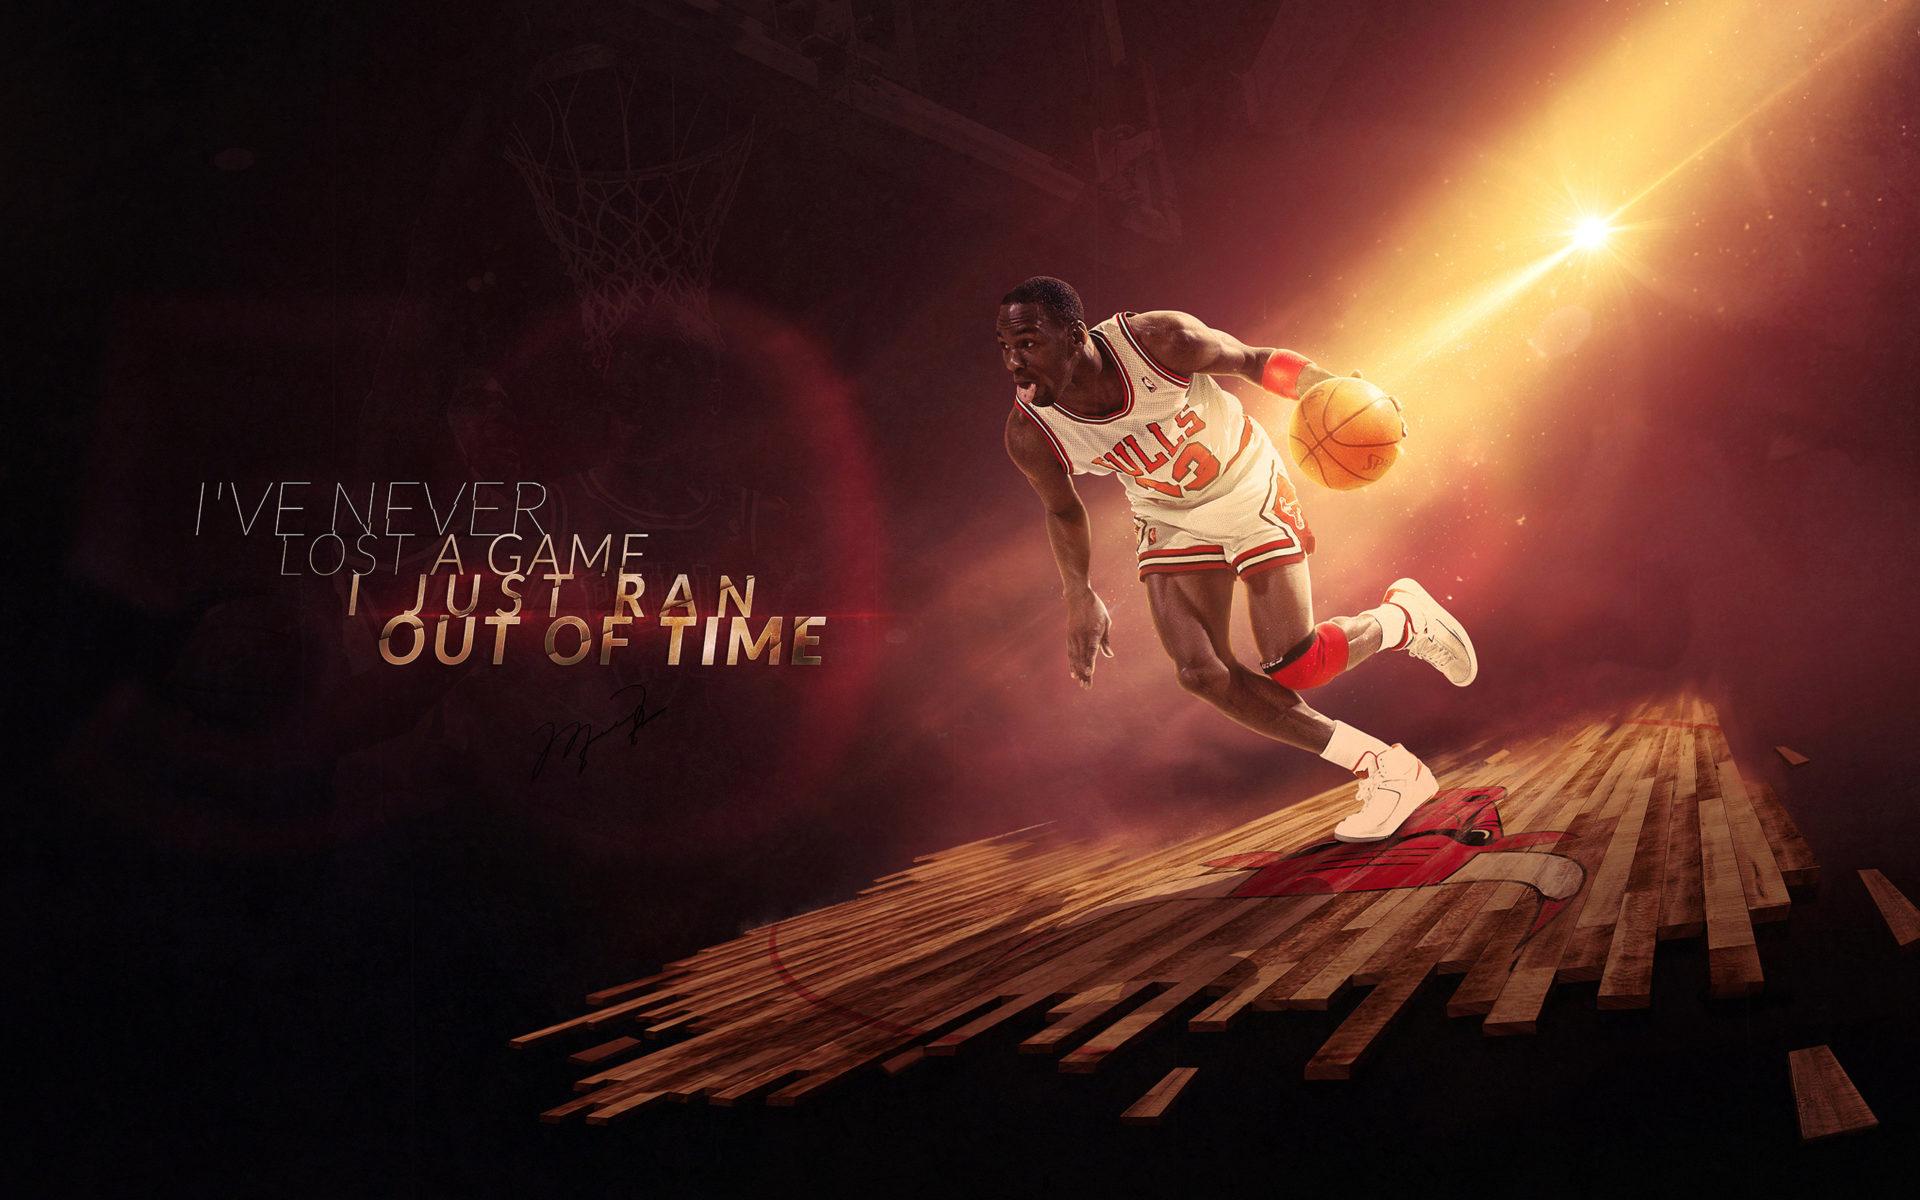 Nba Legends Basketball Hd Wallpaper Theme Sports Fan Tab